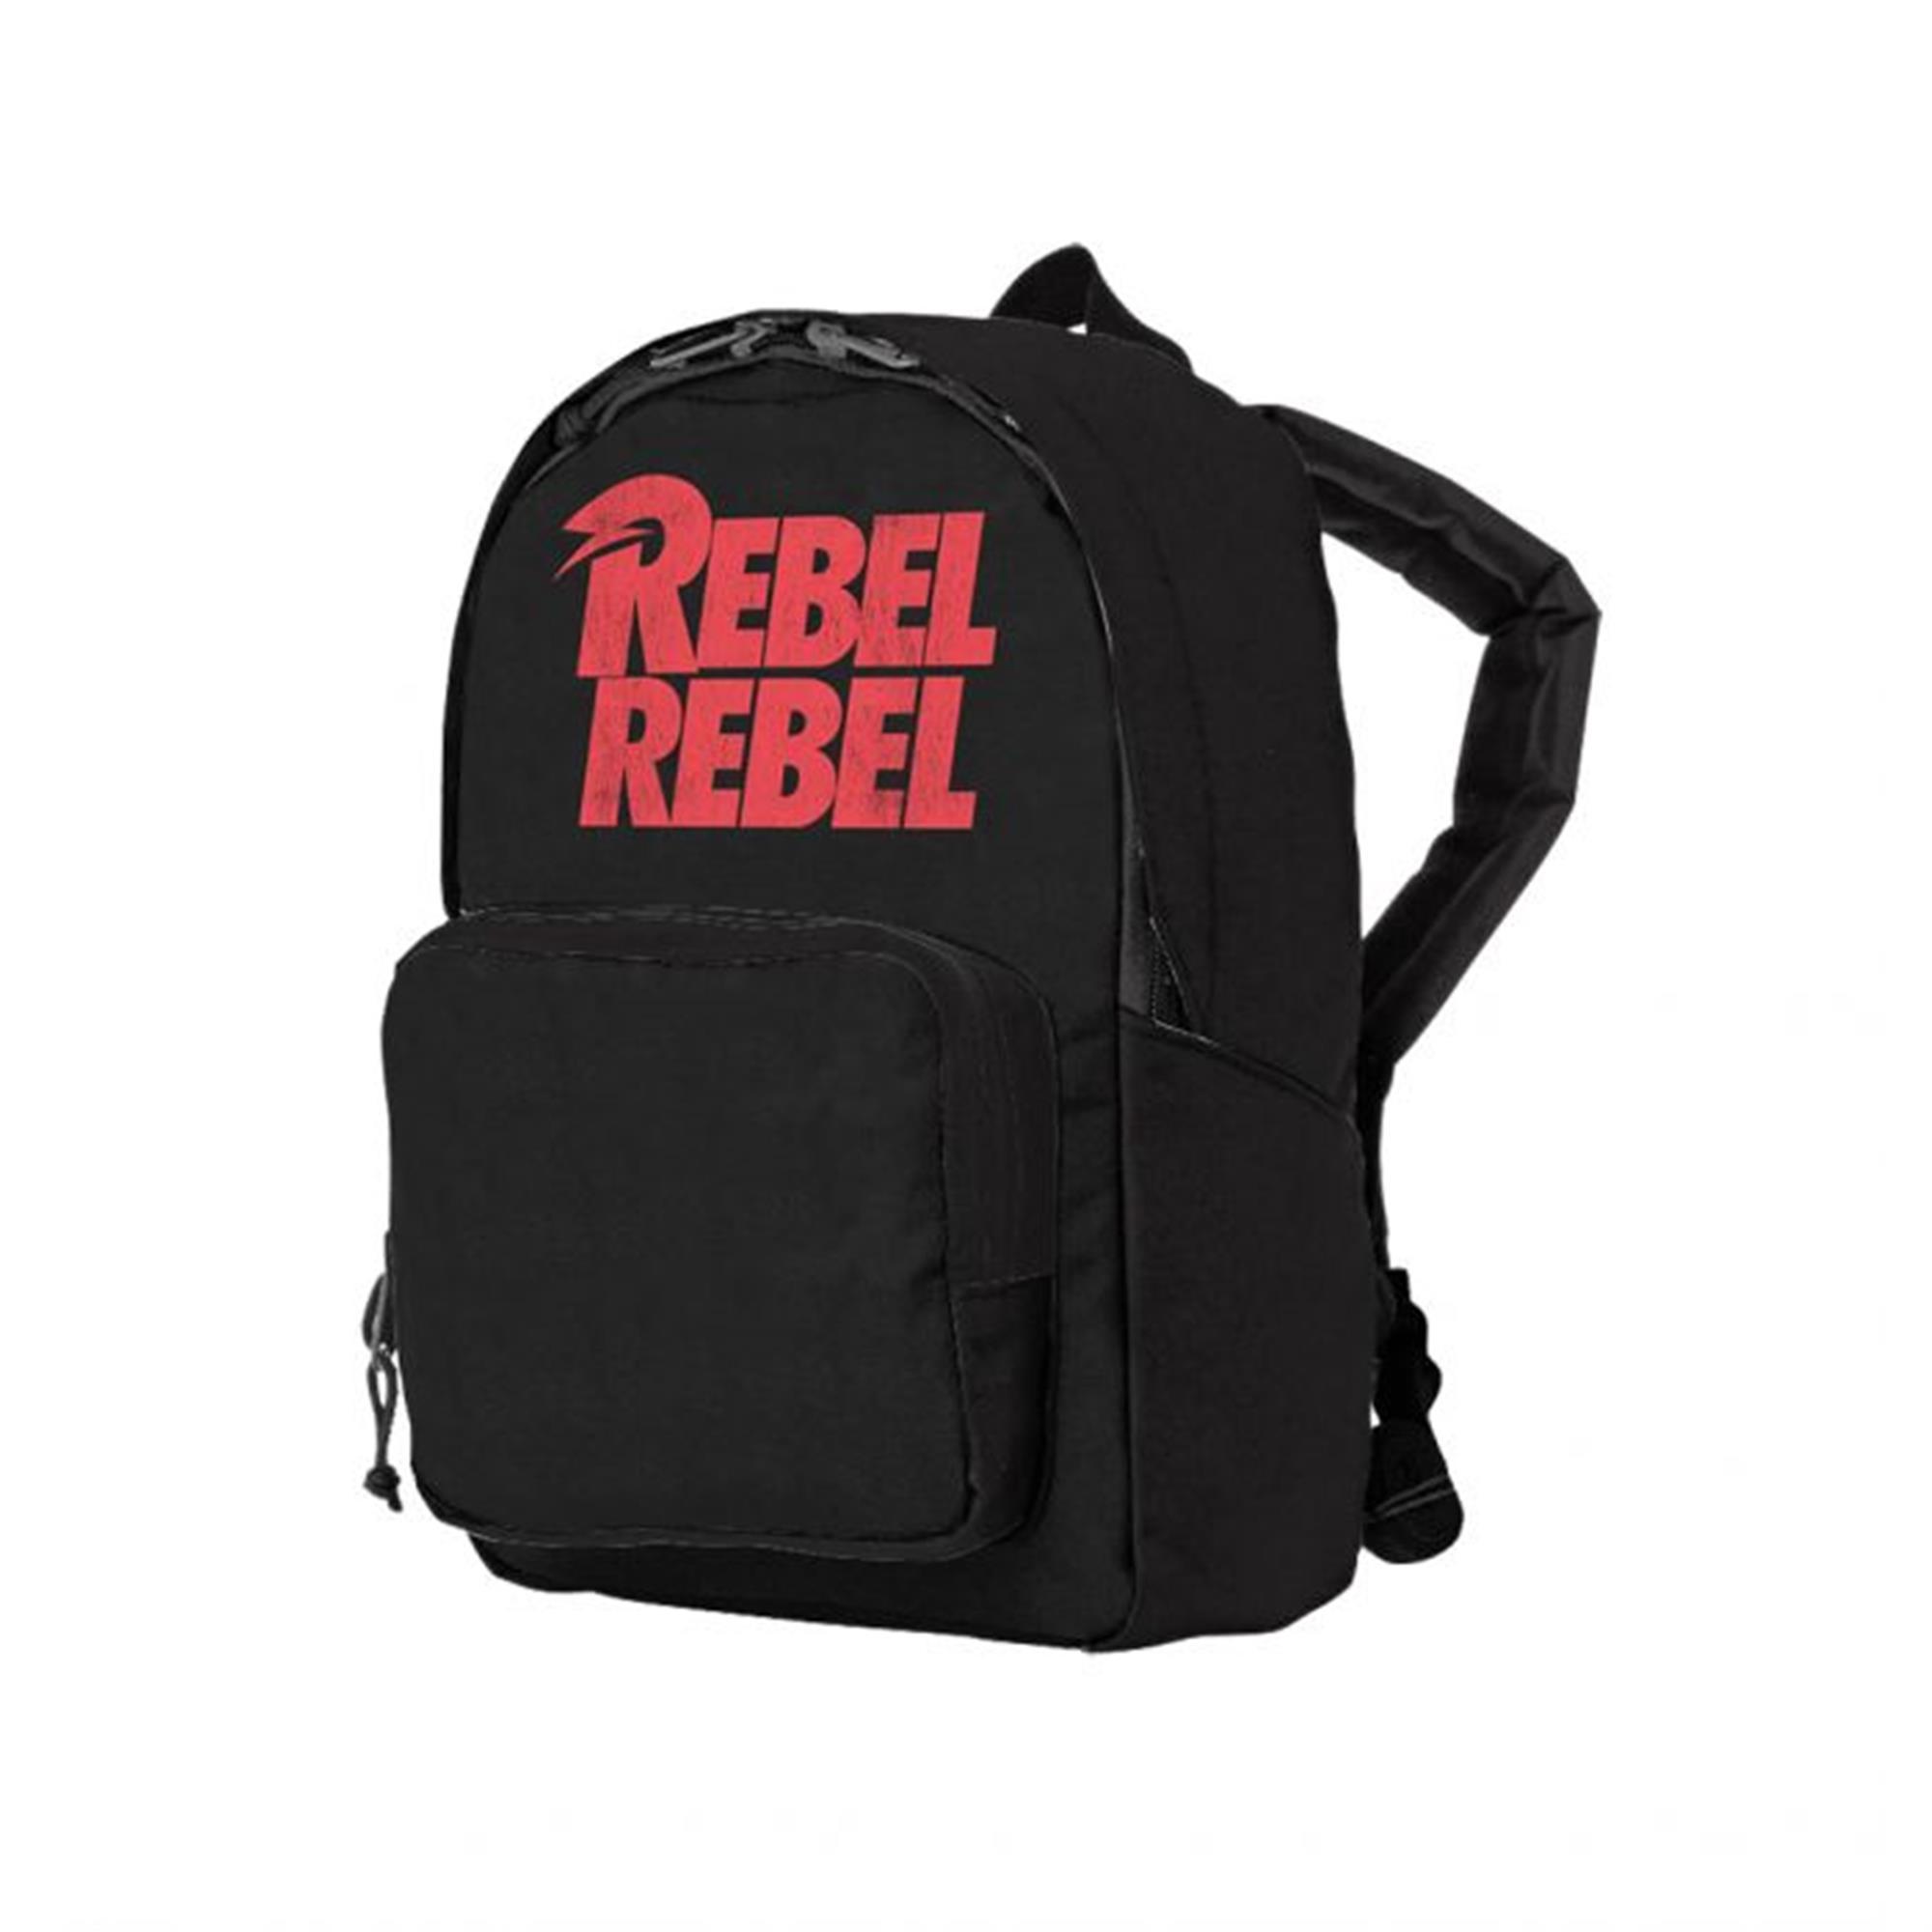 Rebel Rebel Kids Backpack